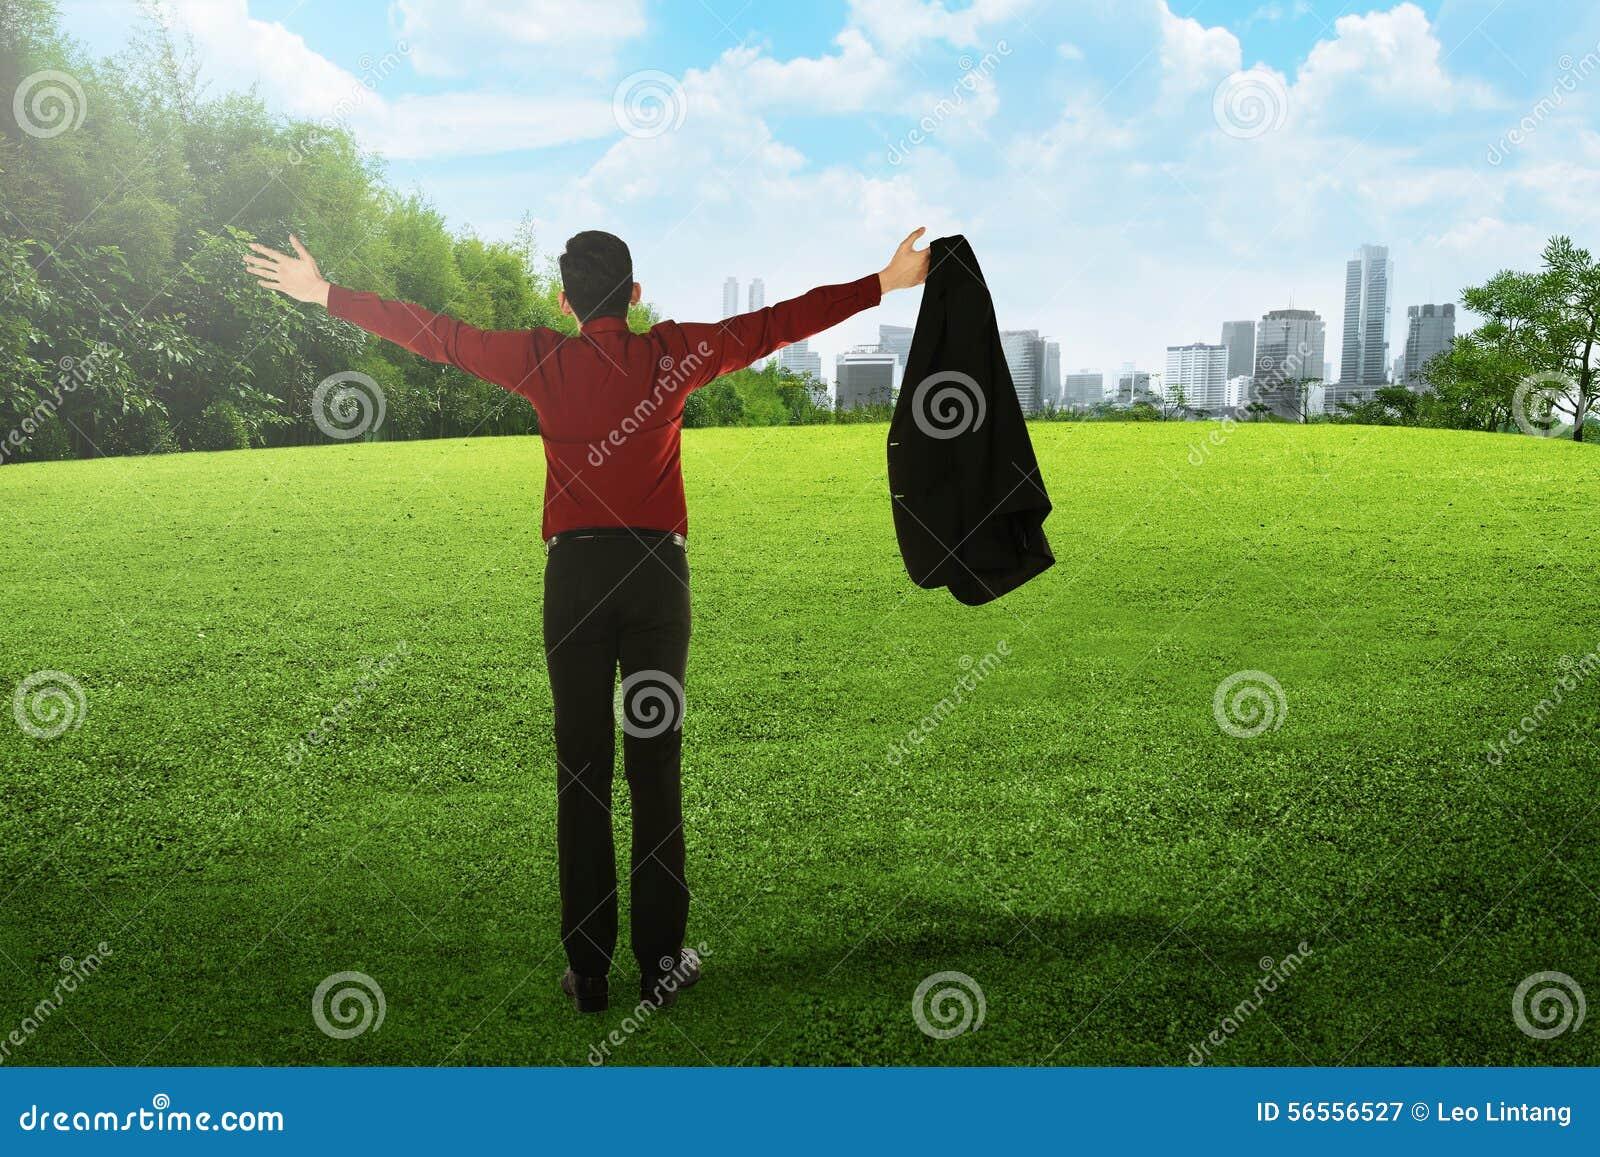 Download Το ασιατικό επιχειρησιακό άτομο ανοίγει το κοστούμι του στο πάρκο πόλεων Στοκ Εικόνα - εικόνα από ασιατικοί, πράσινος: 56556527